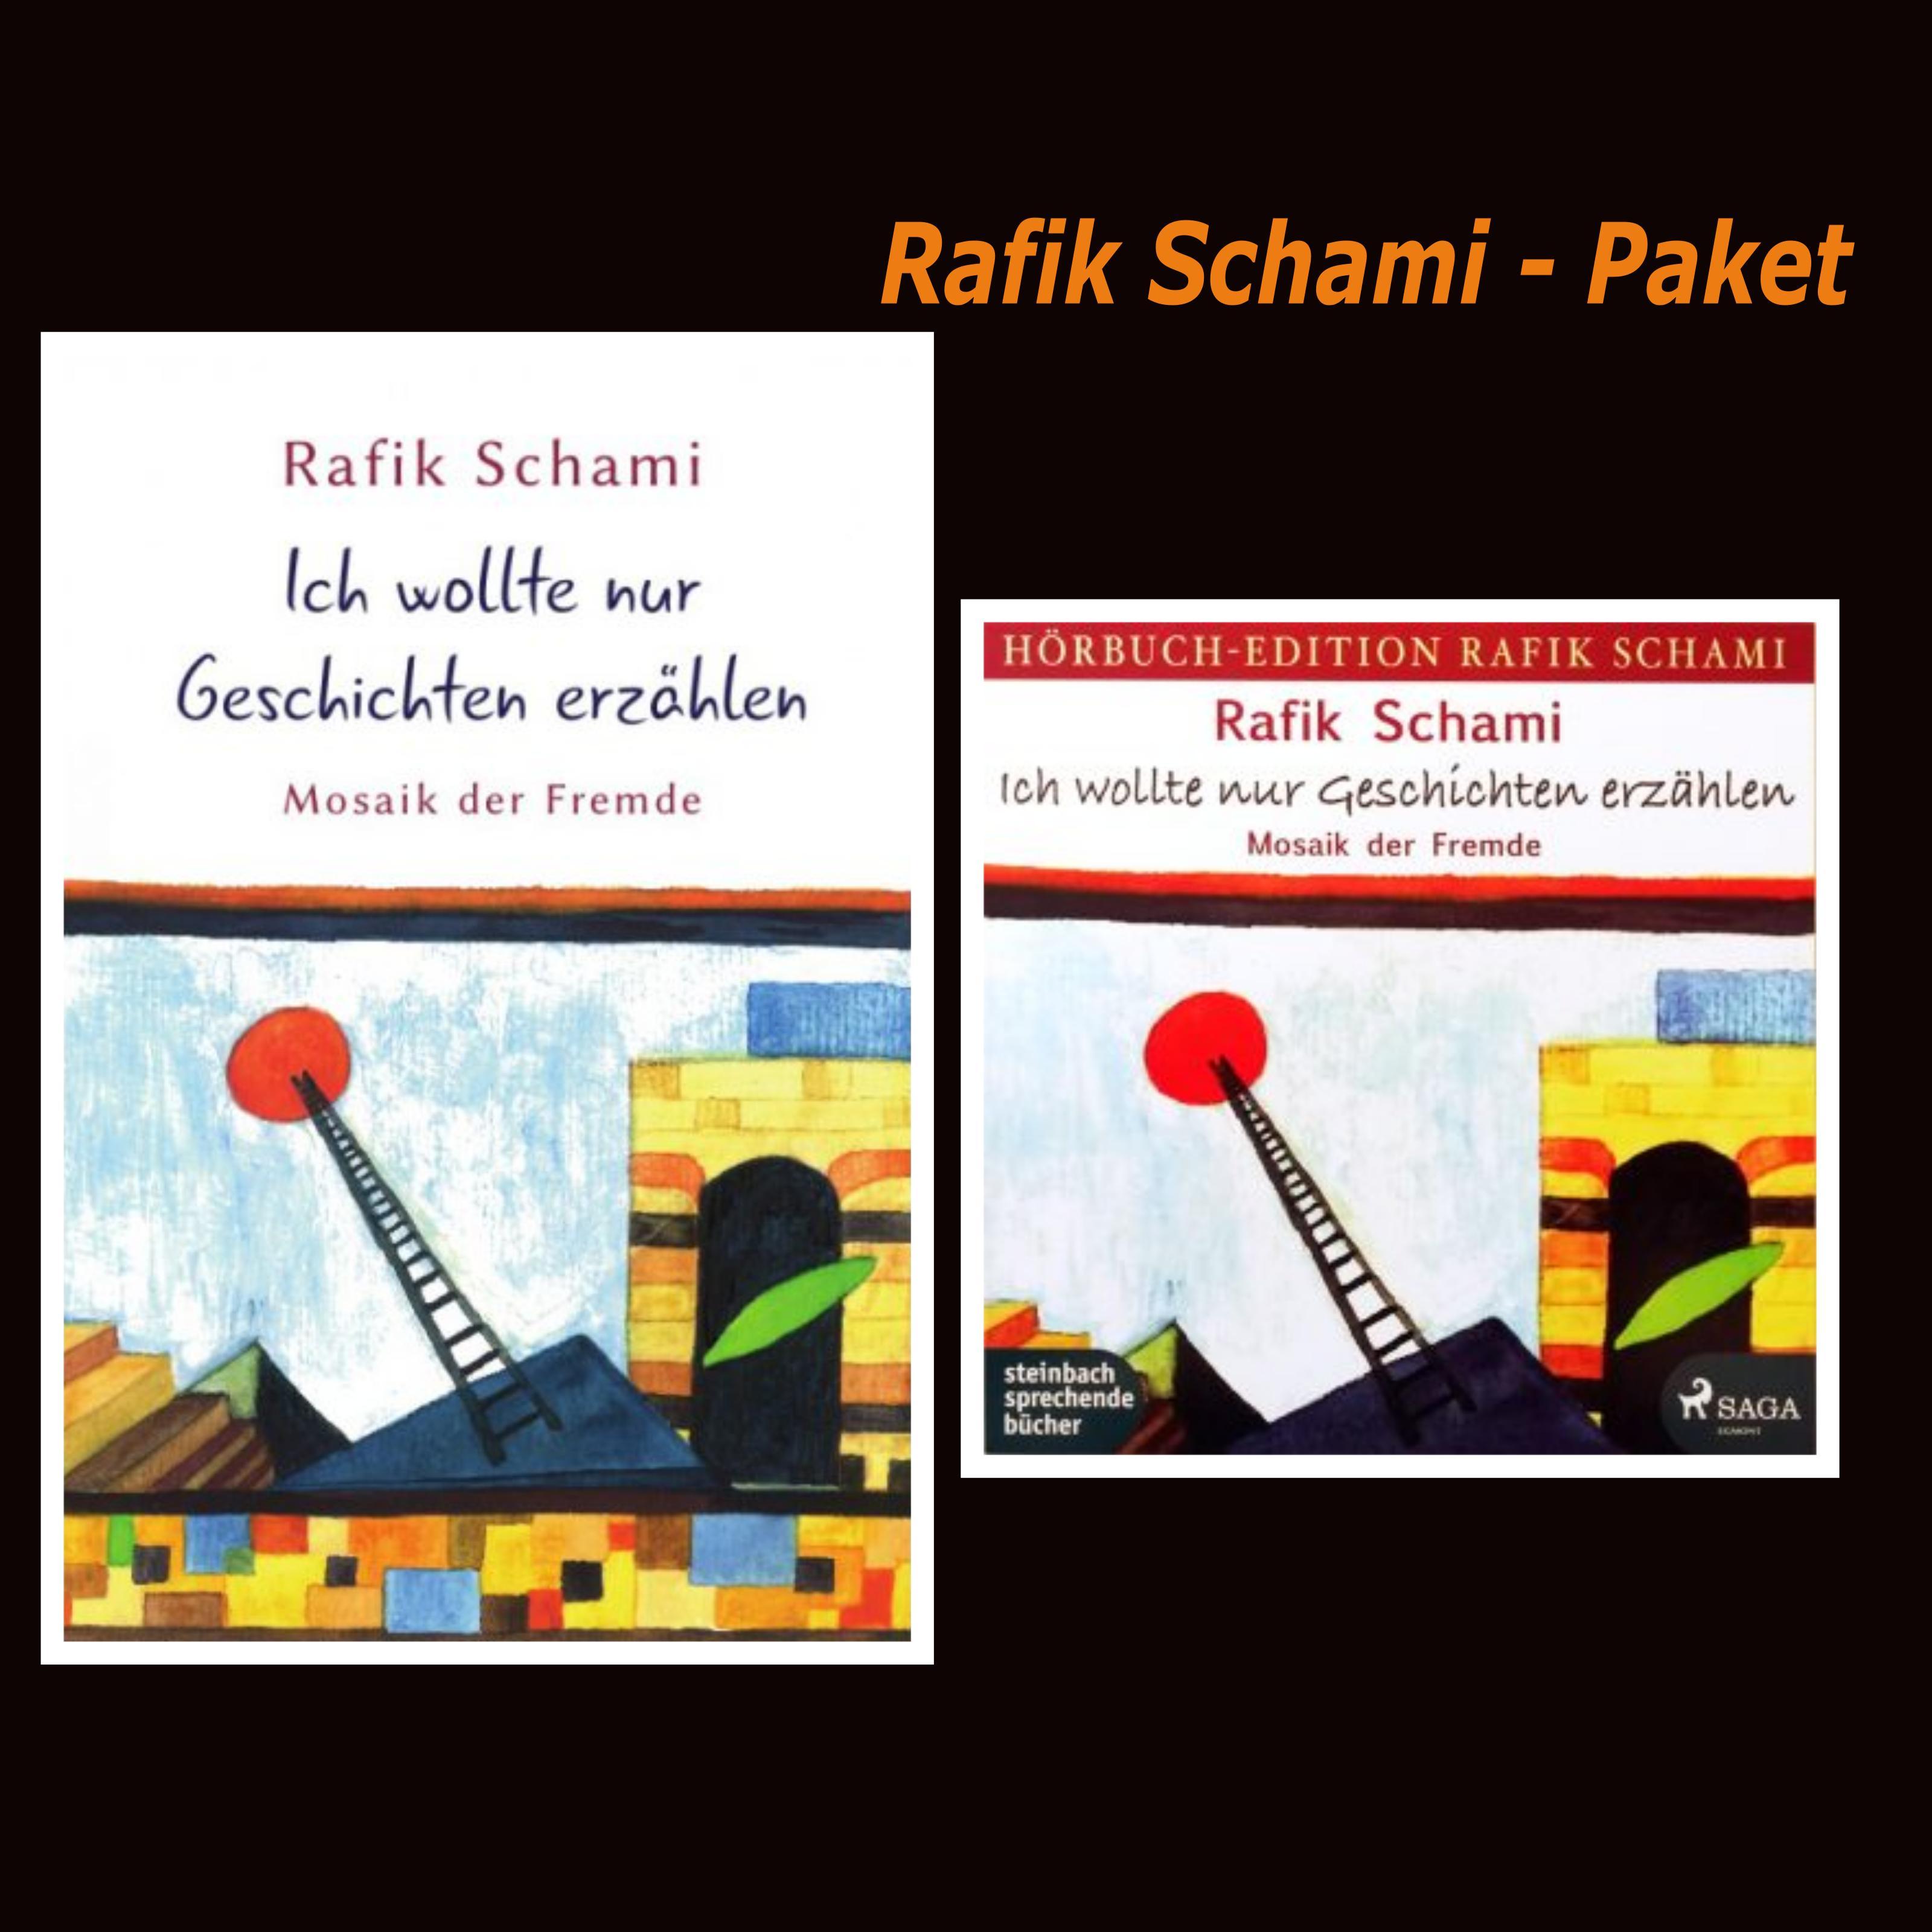 Rafik Schami – Paket